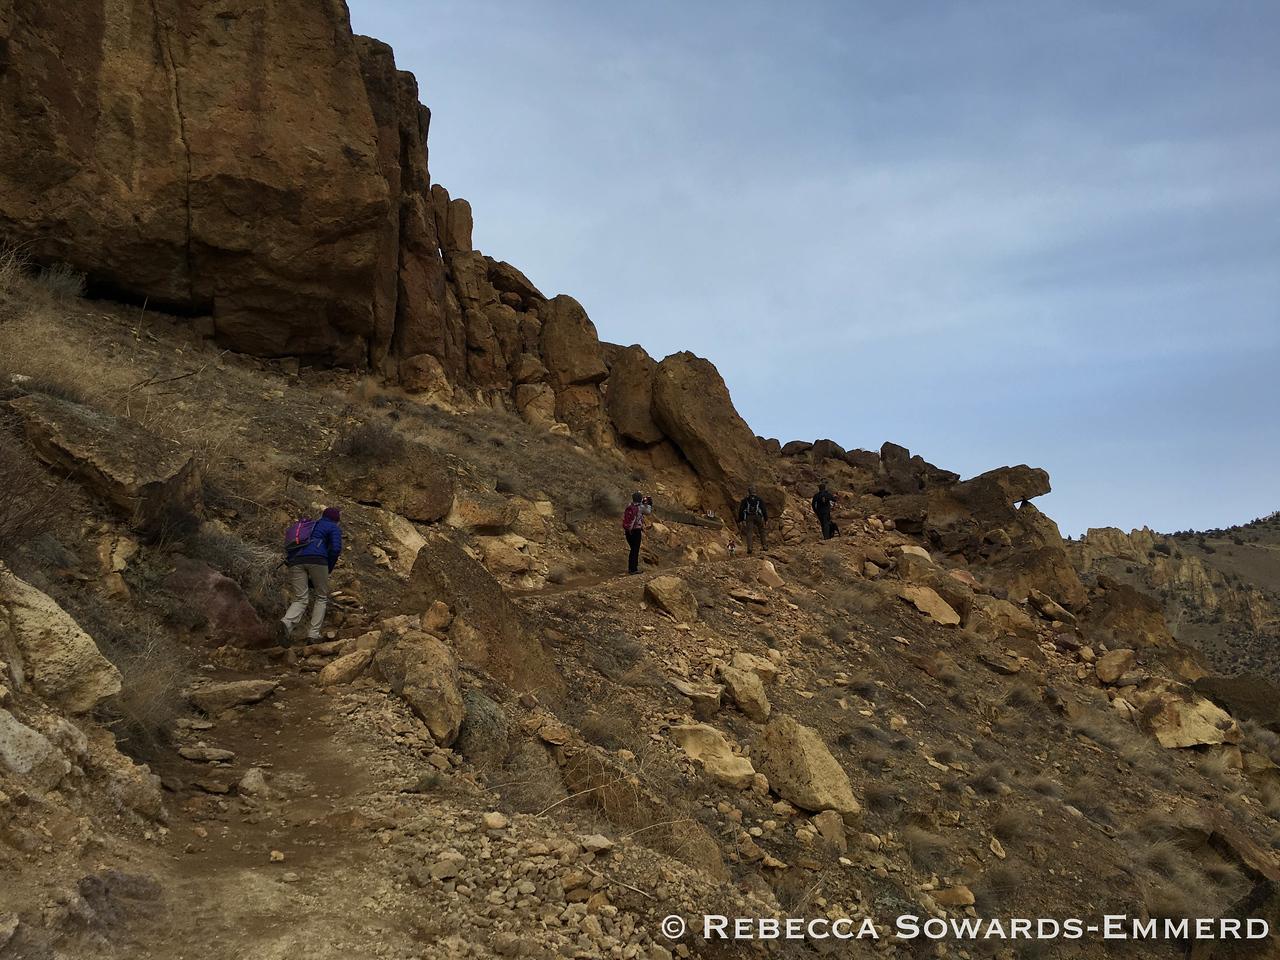 Hiking at Smith Rock